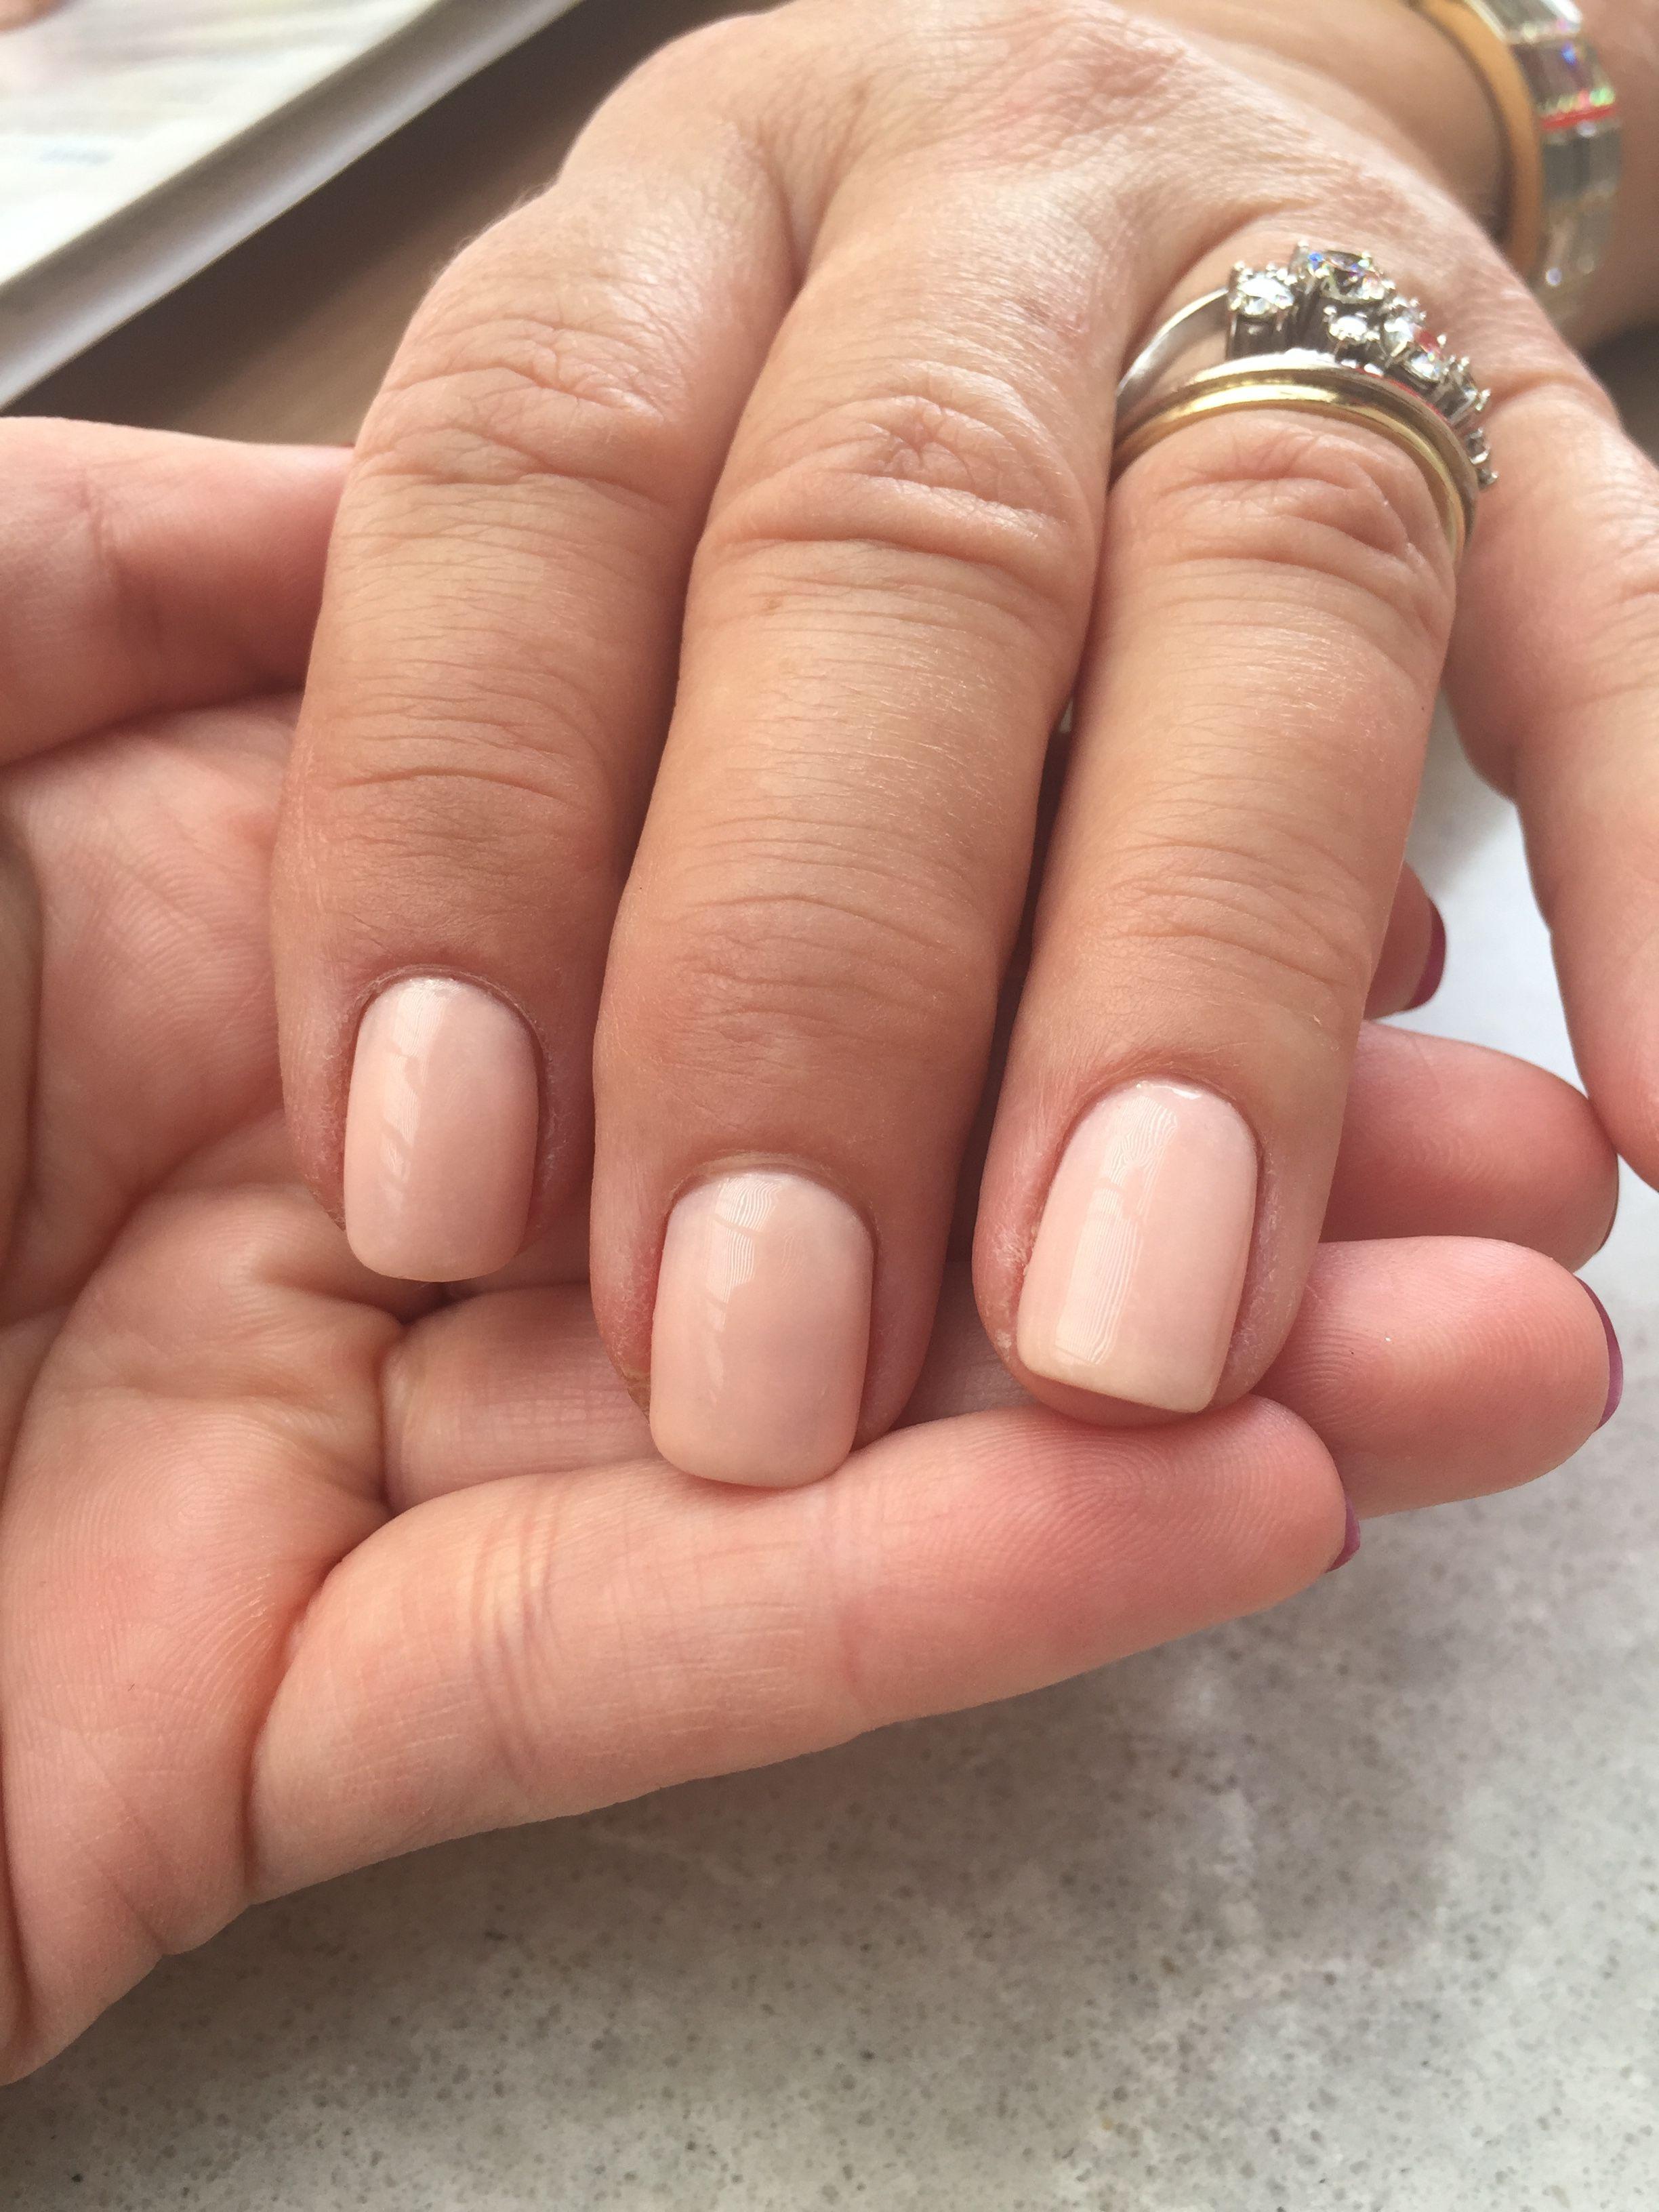 5f4e3340c8ed5 Nails at Thandi- gel | Beauty school dropout | Gel Nails, Nails, Beauty